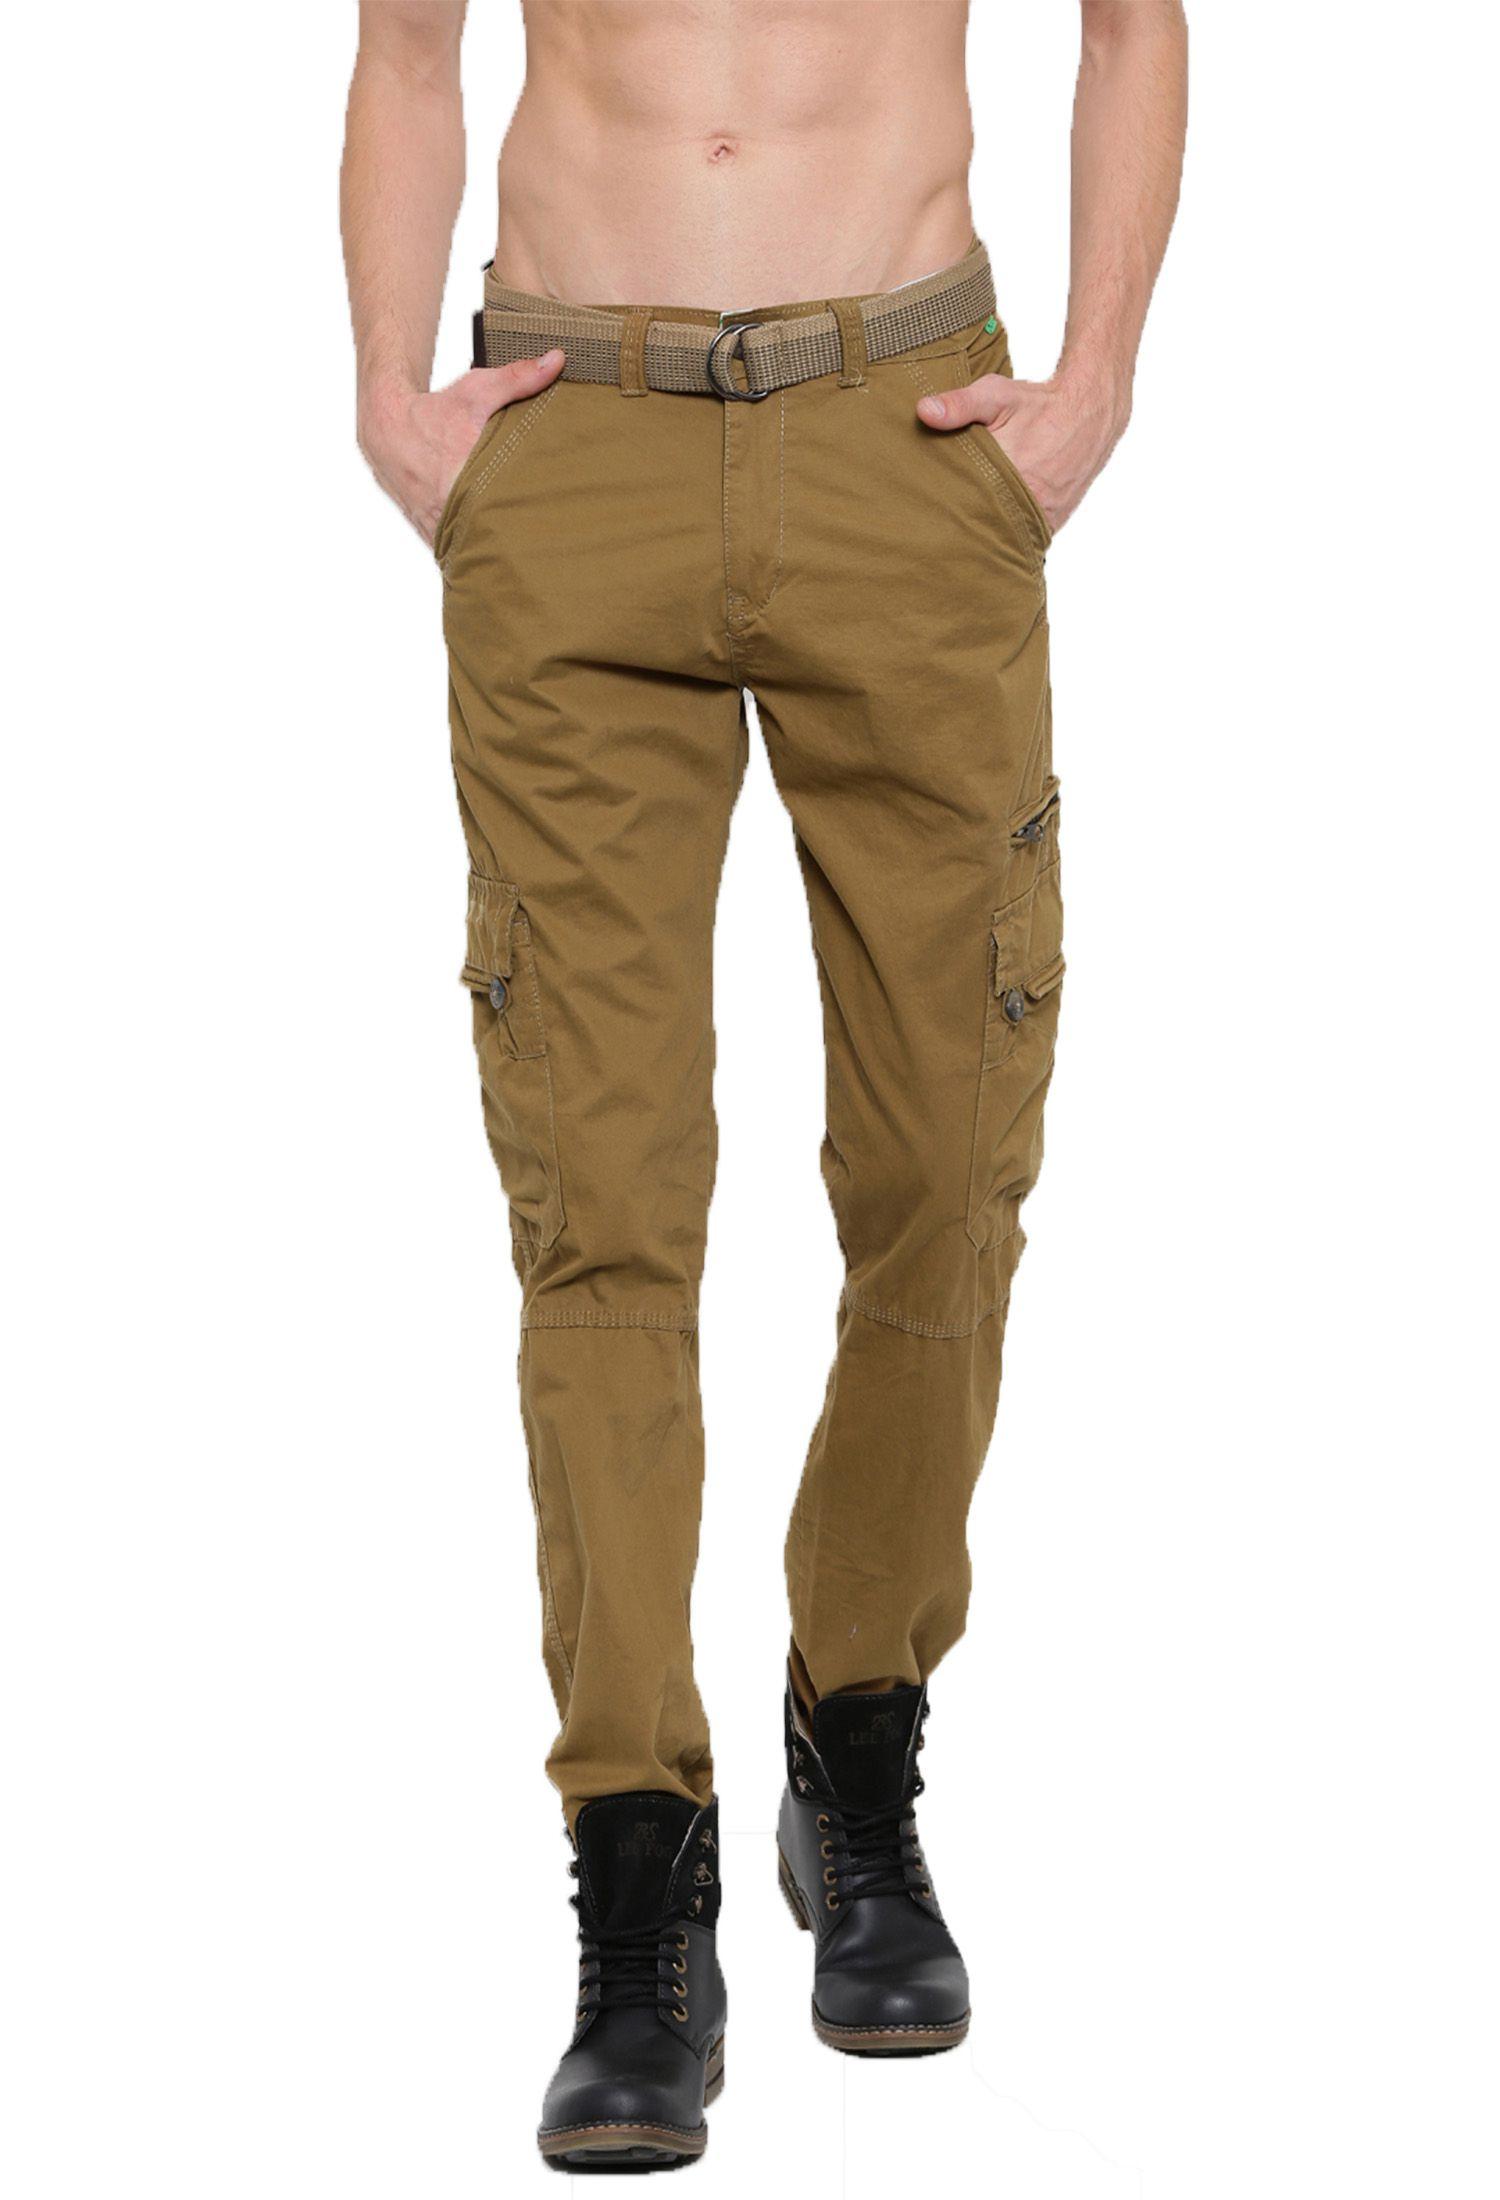 SPORTS 52 WEAR Khaki Regular -Fit Flat Cargos